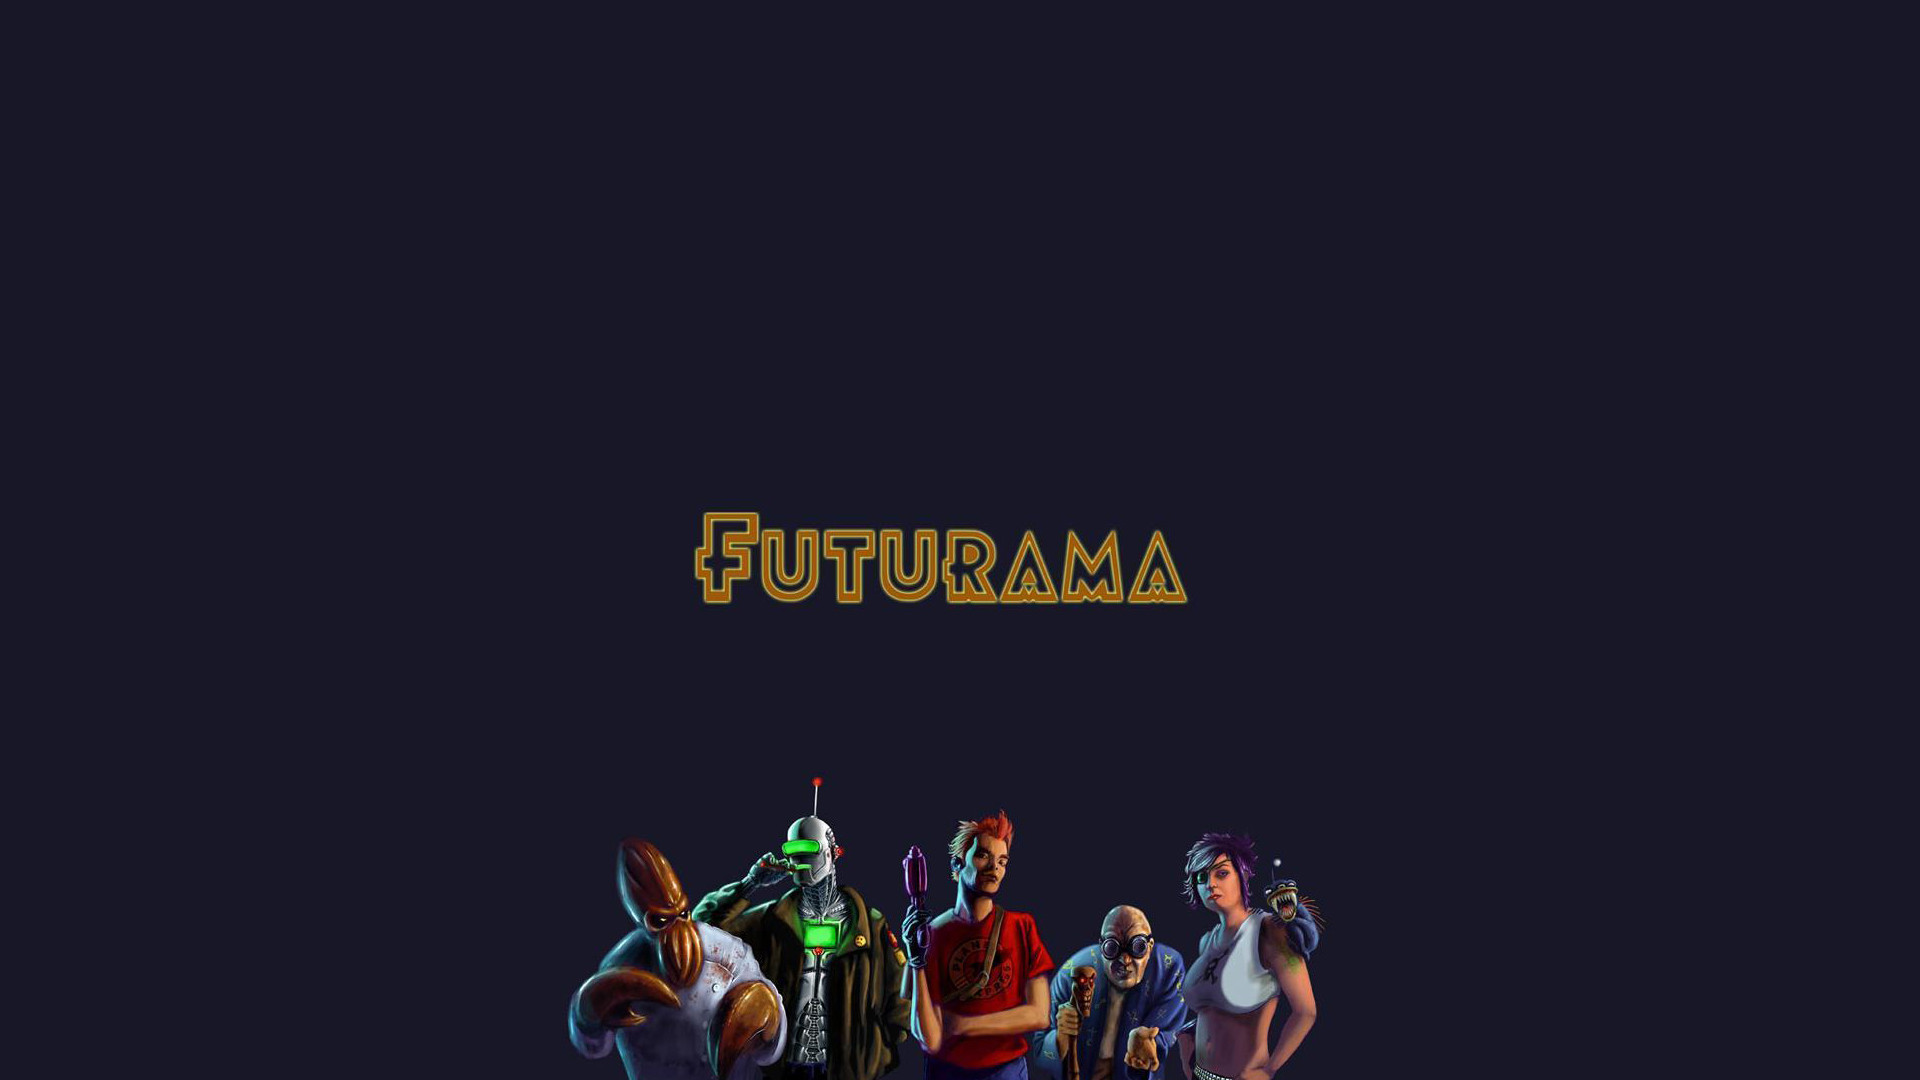 Futurama Wallpaper – Mind Control Industries Graphic Design Madison 5